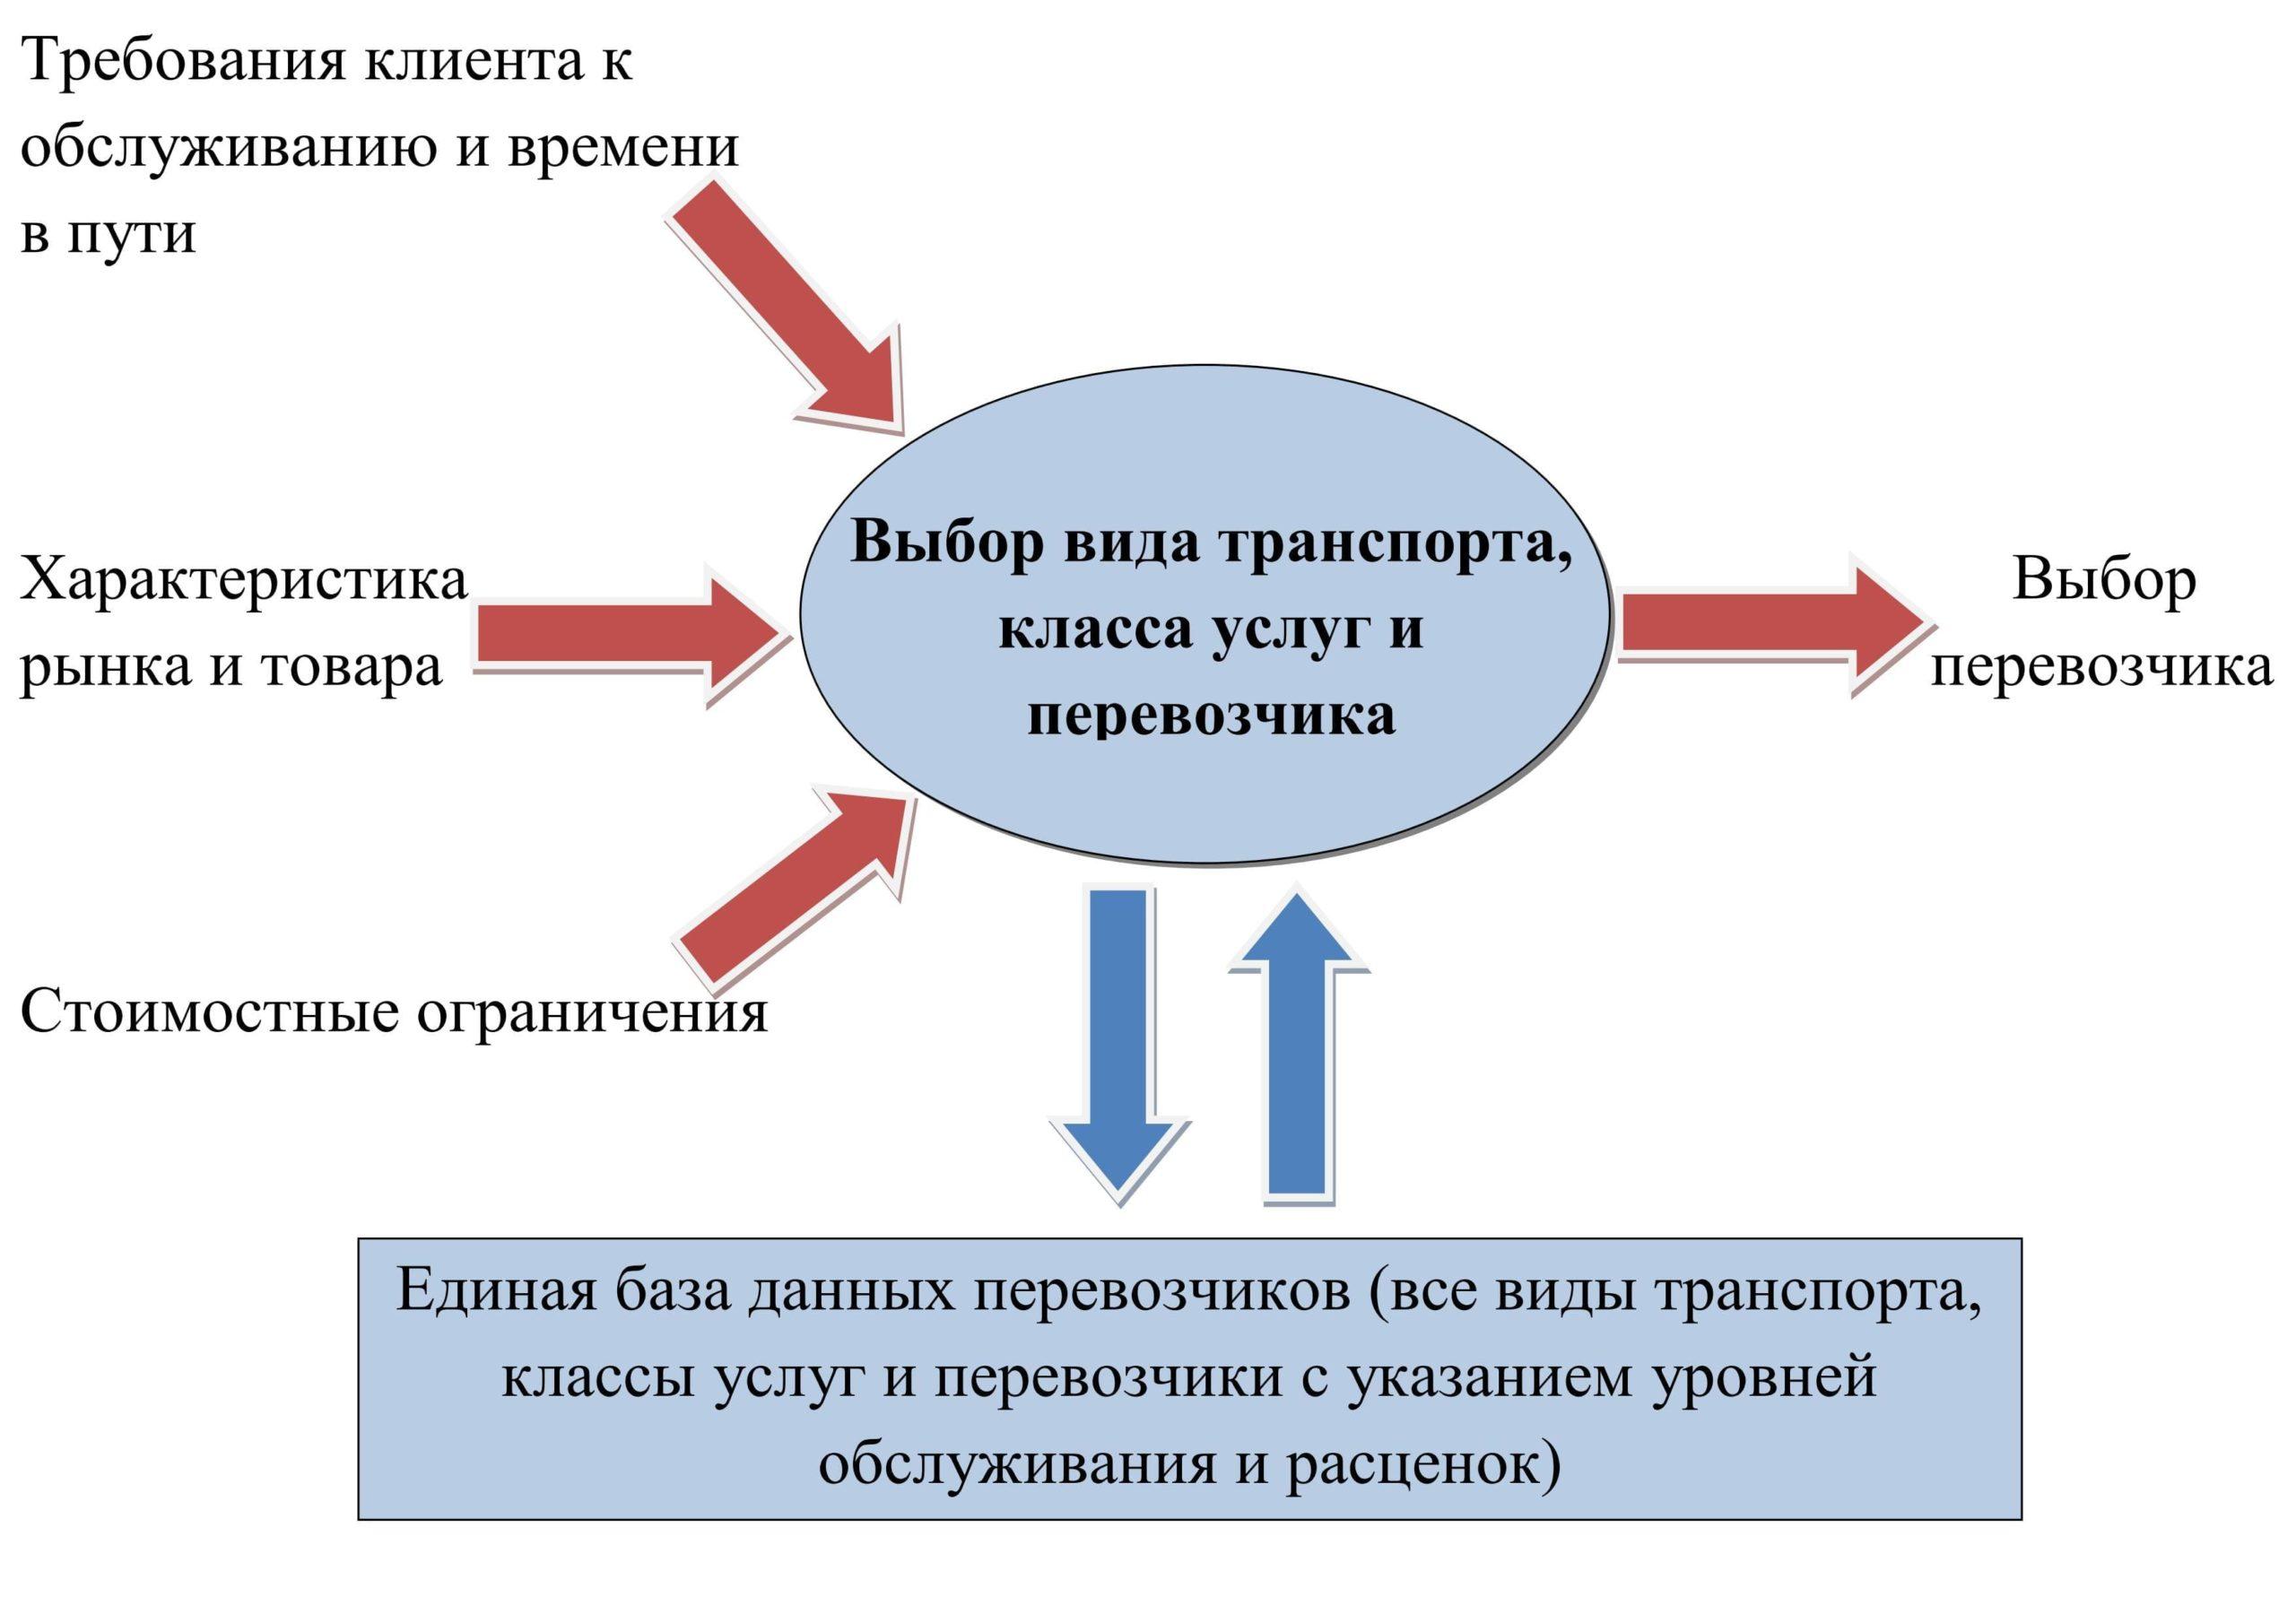 Схема выбора вида транспорта и перевозчика